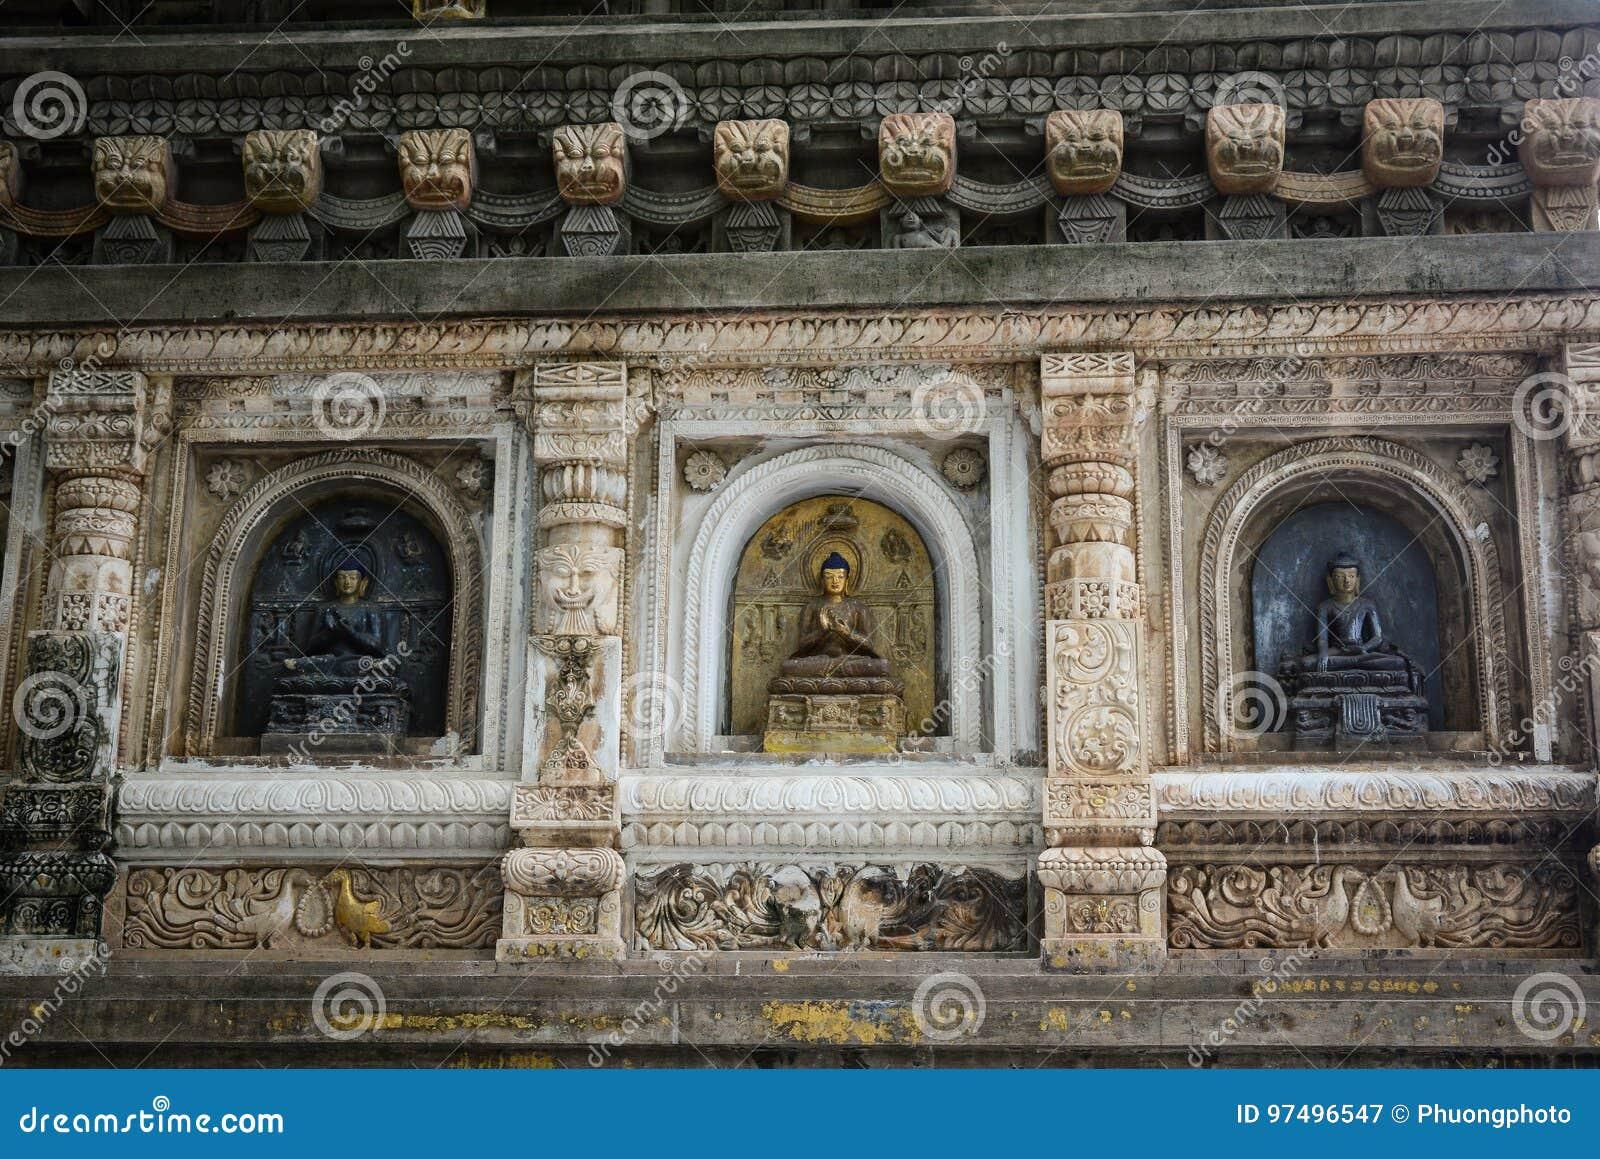 Complesso del tempio di Mahabodhi in Gaya, India